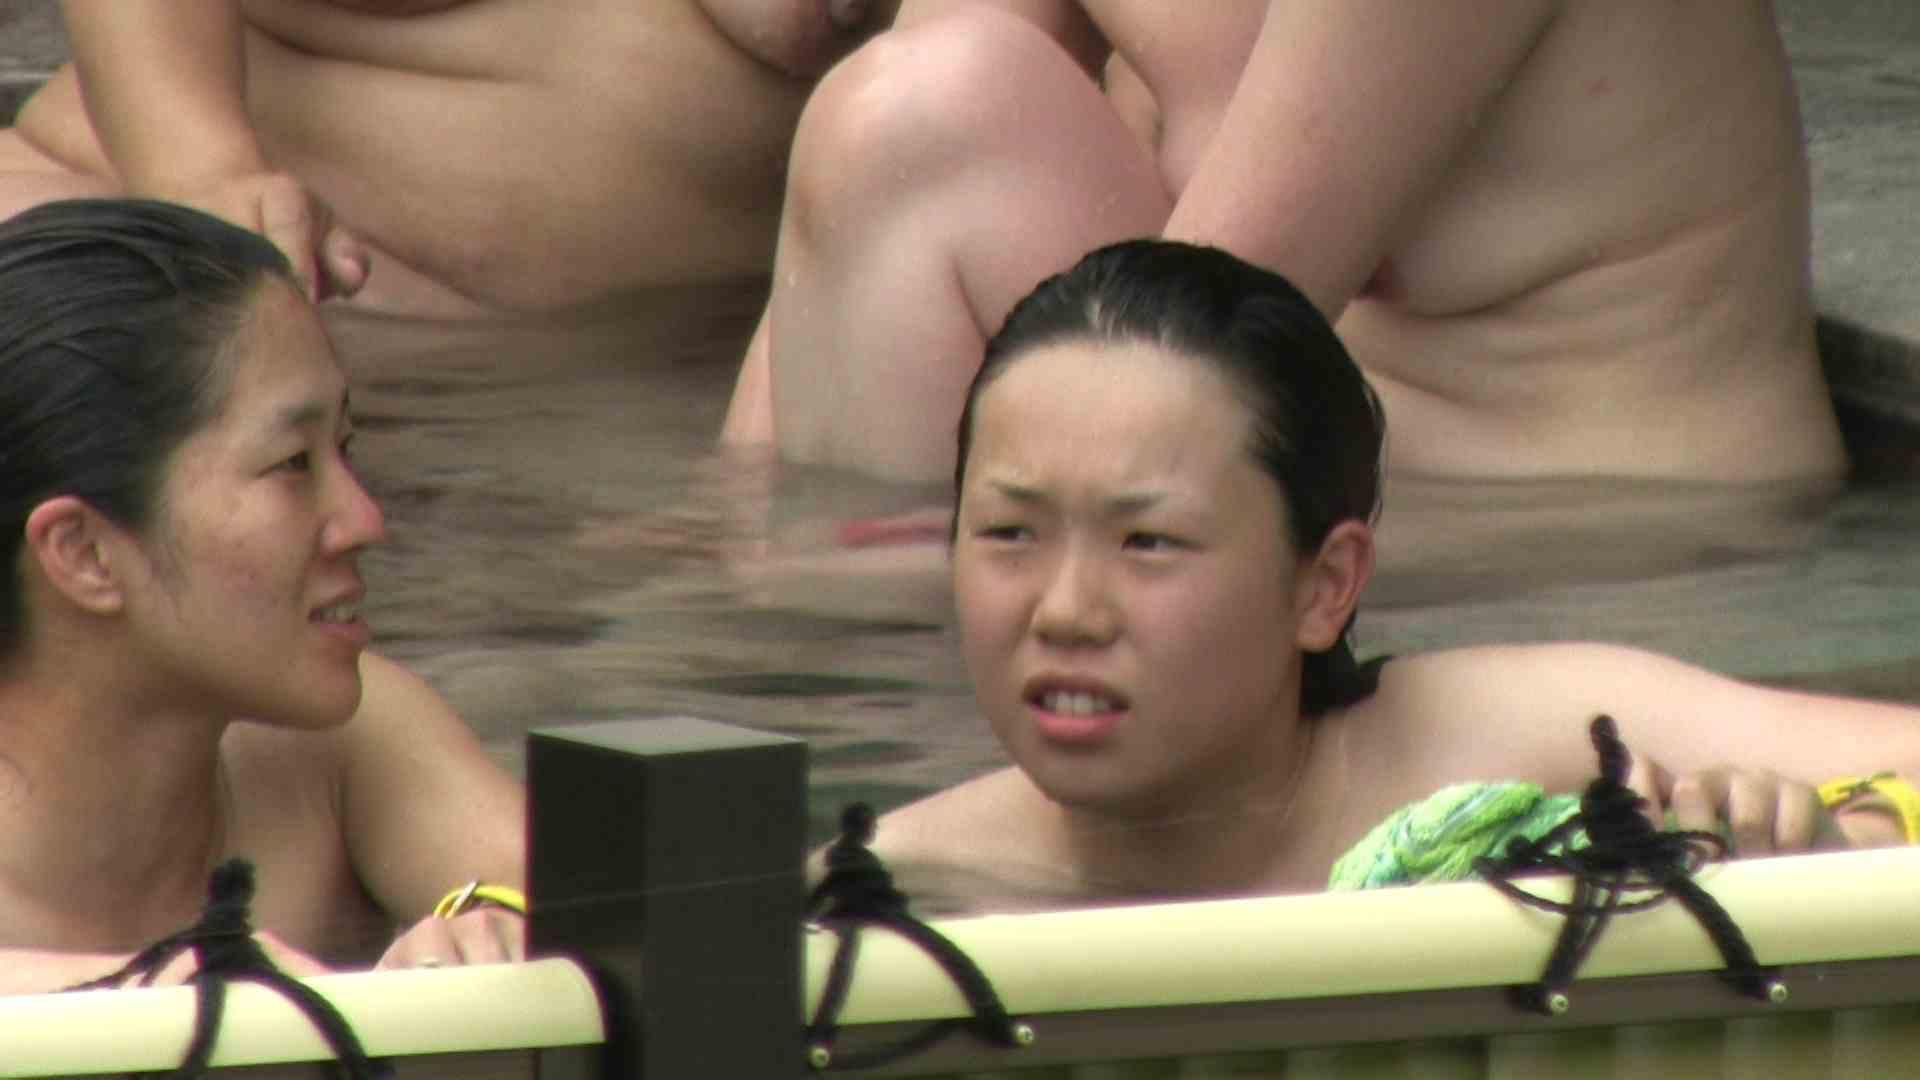 Aquaな露天風呂Vol.205 OLセックス 覗き性交動画流出 105画像 68